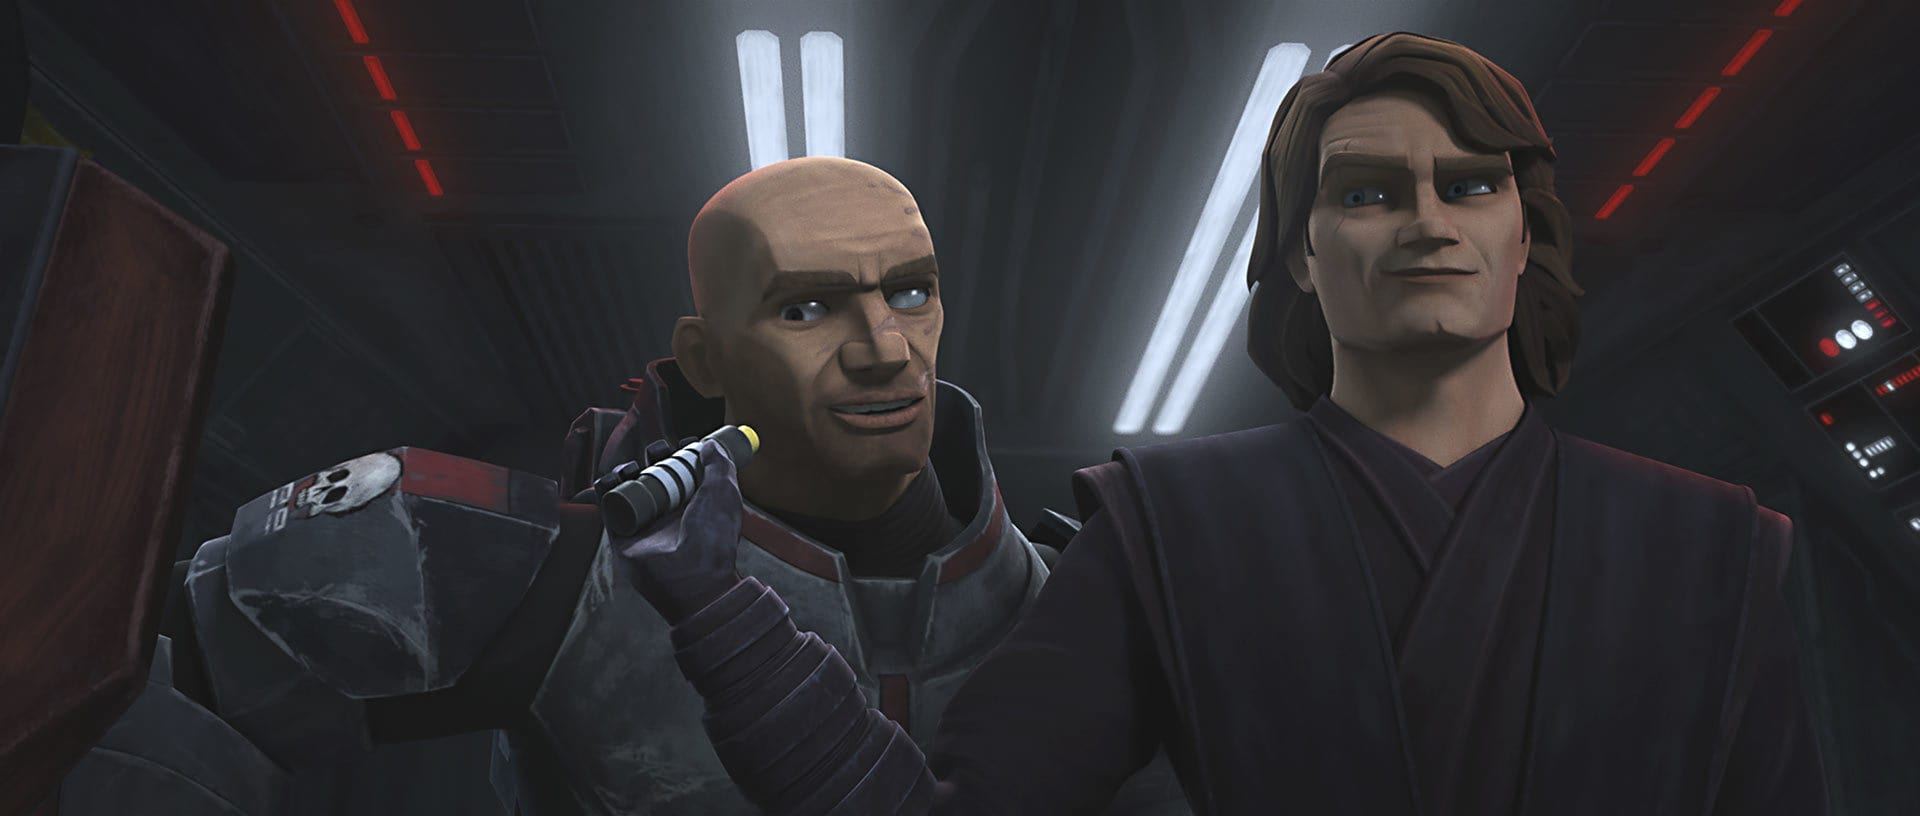 Wrecker and Anakin